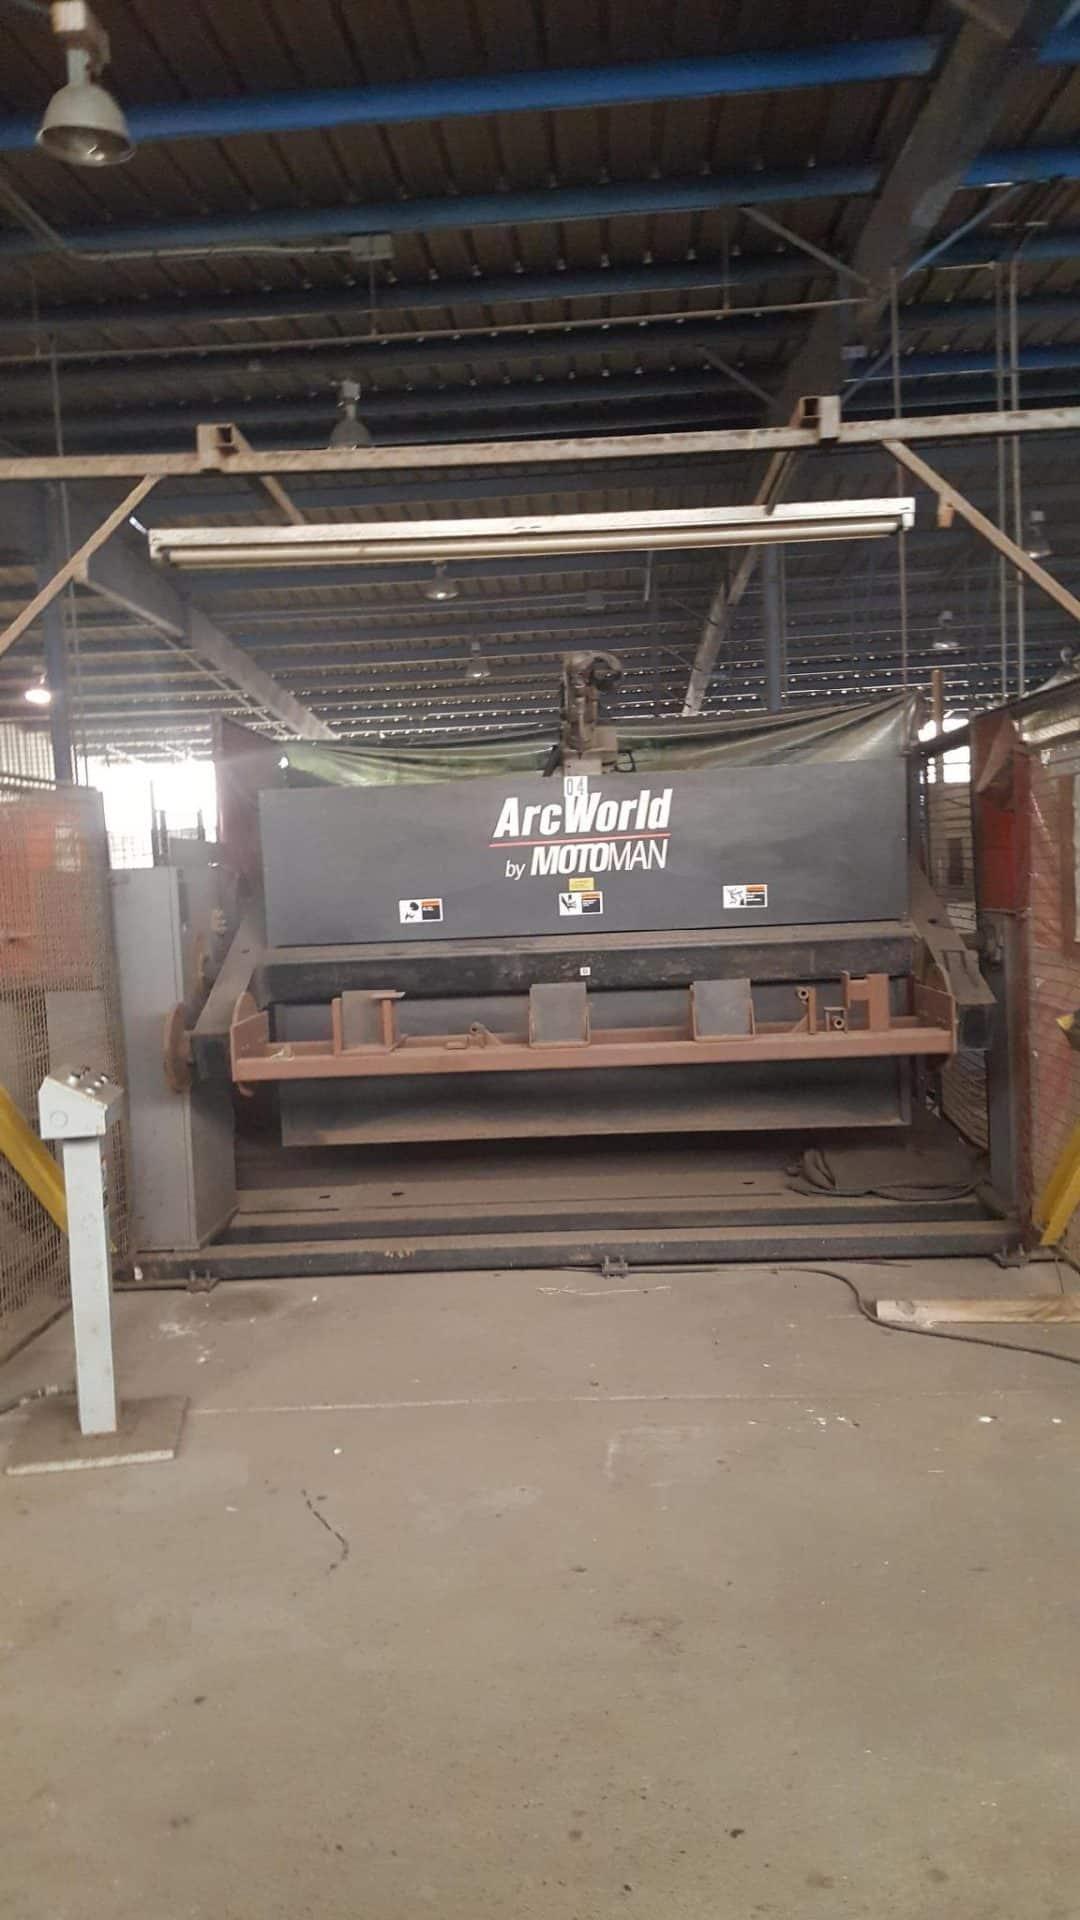 2003 Motoman Arcworld 6000